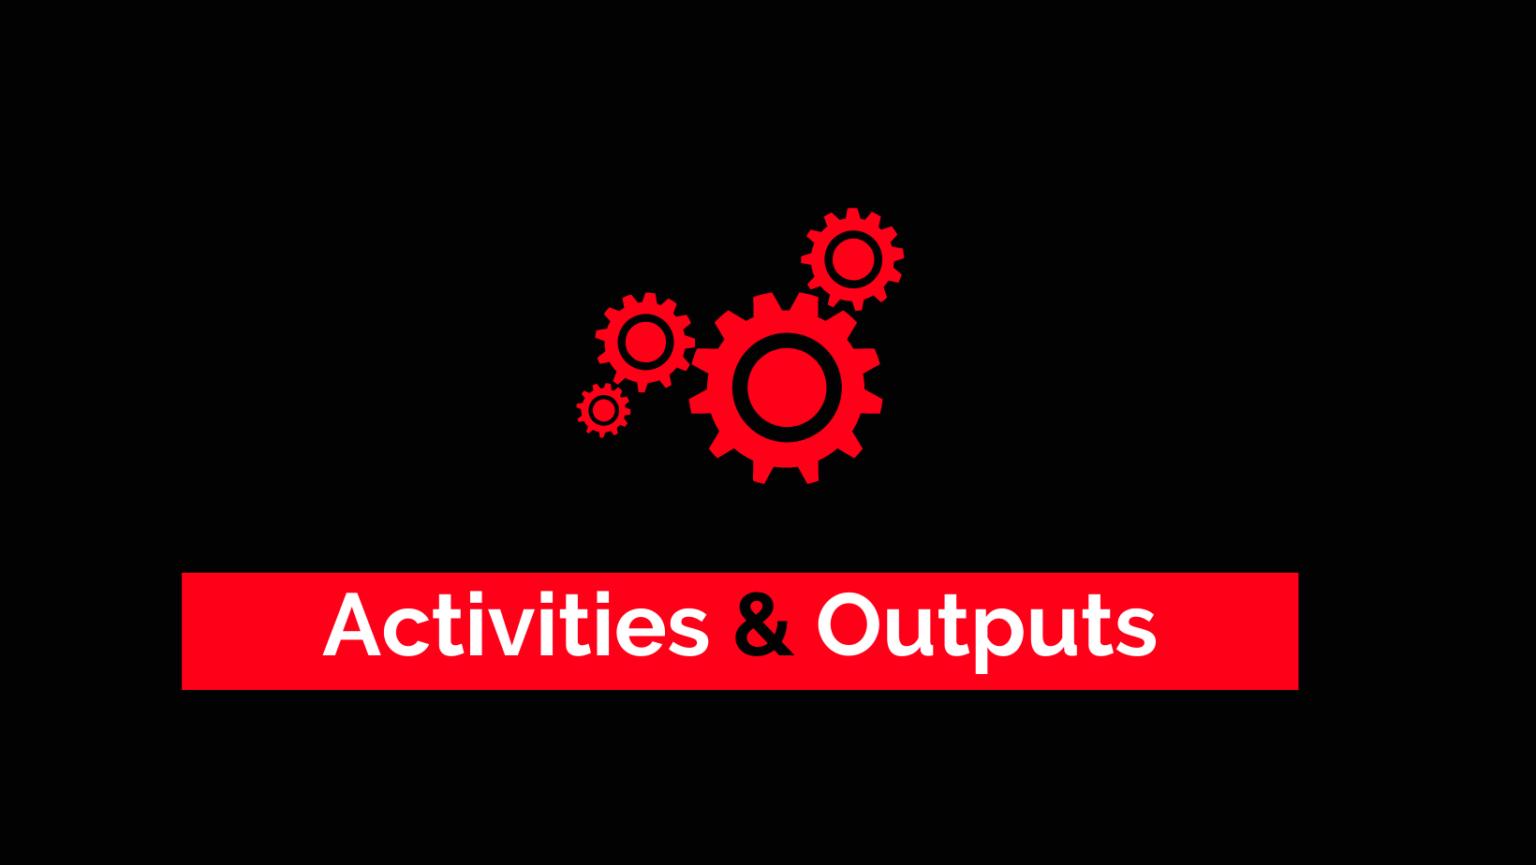 C&D – Activities & Outputs